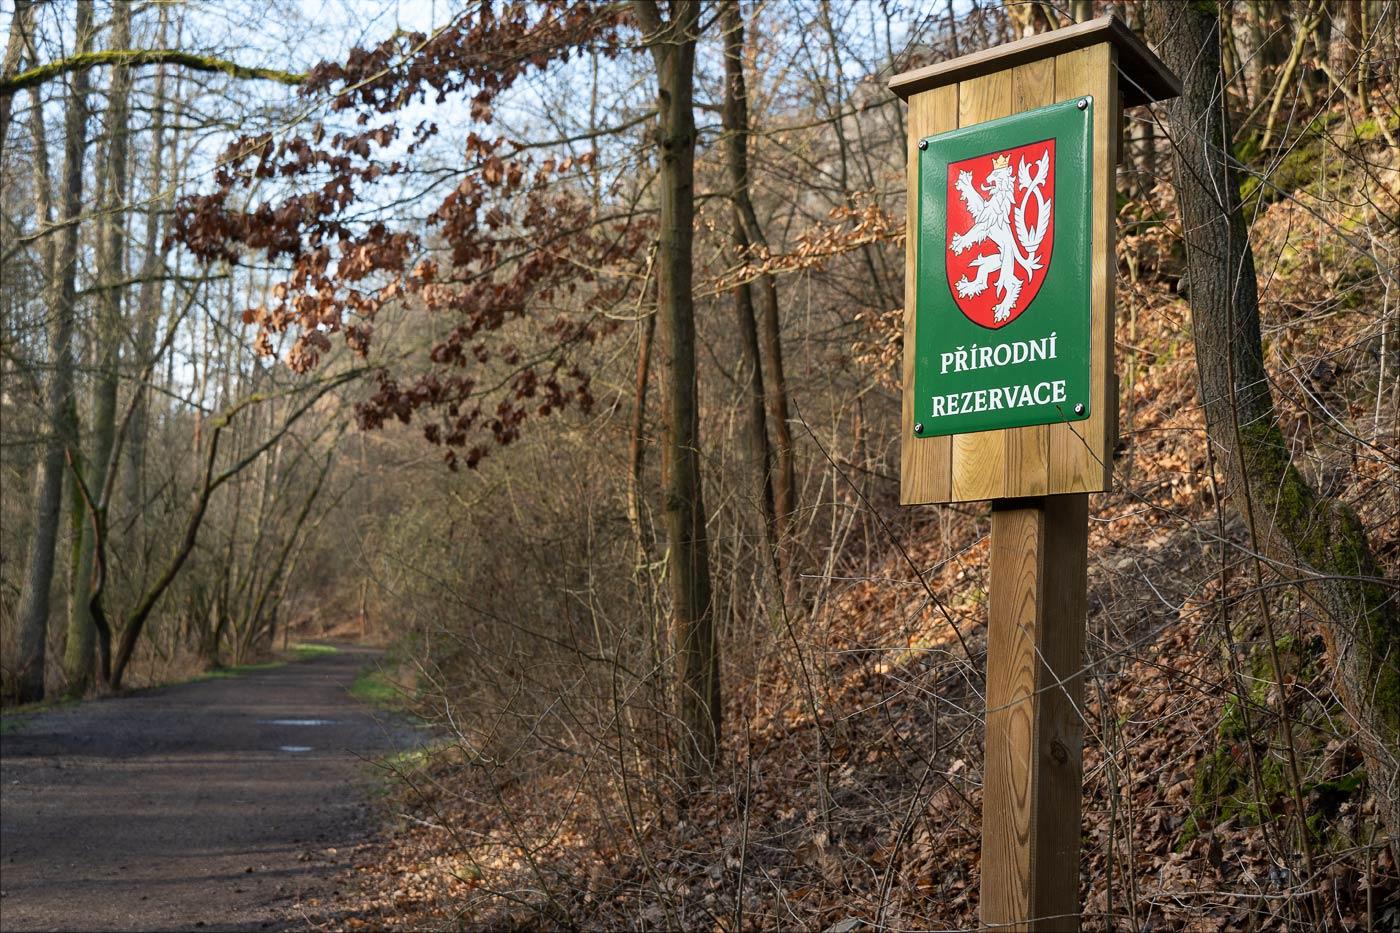 Прогулочный маршрут Тихое удолье, Розтоки у Праги